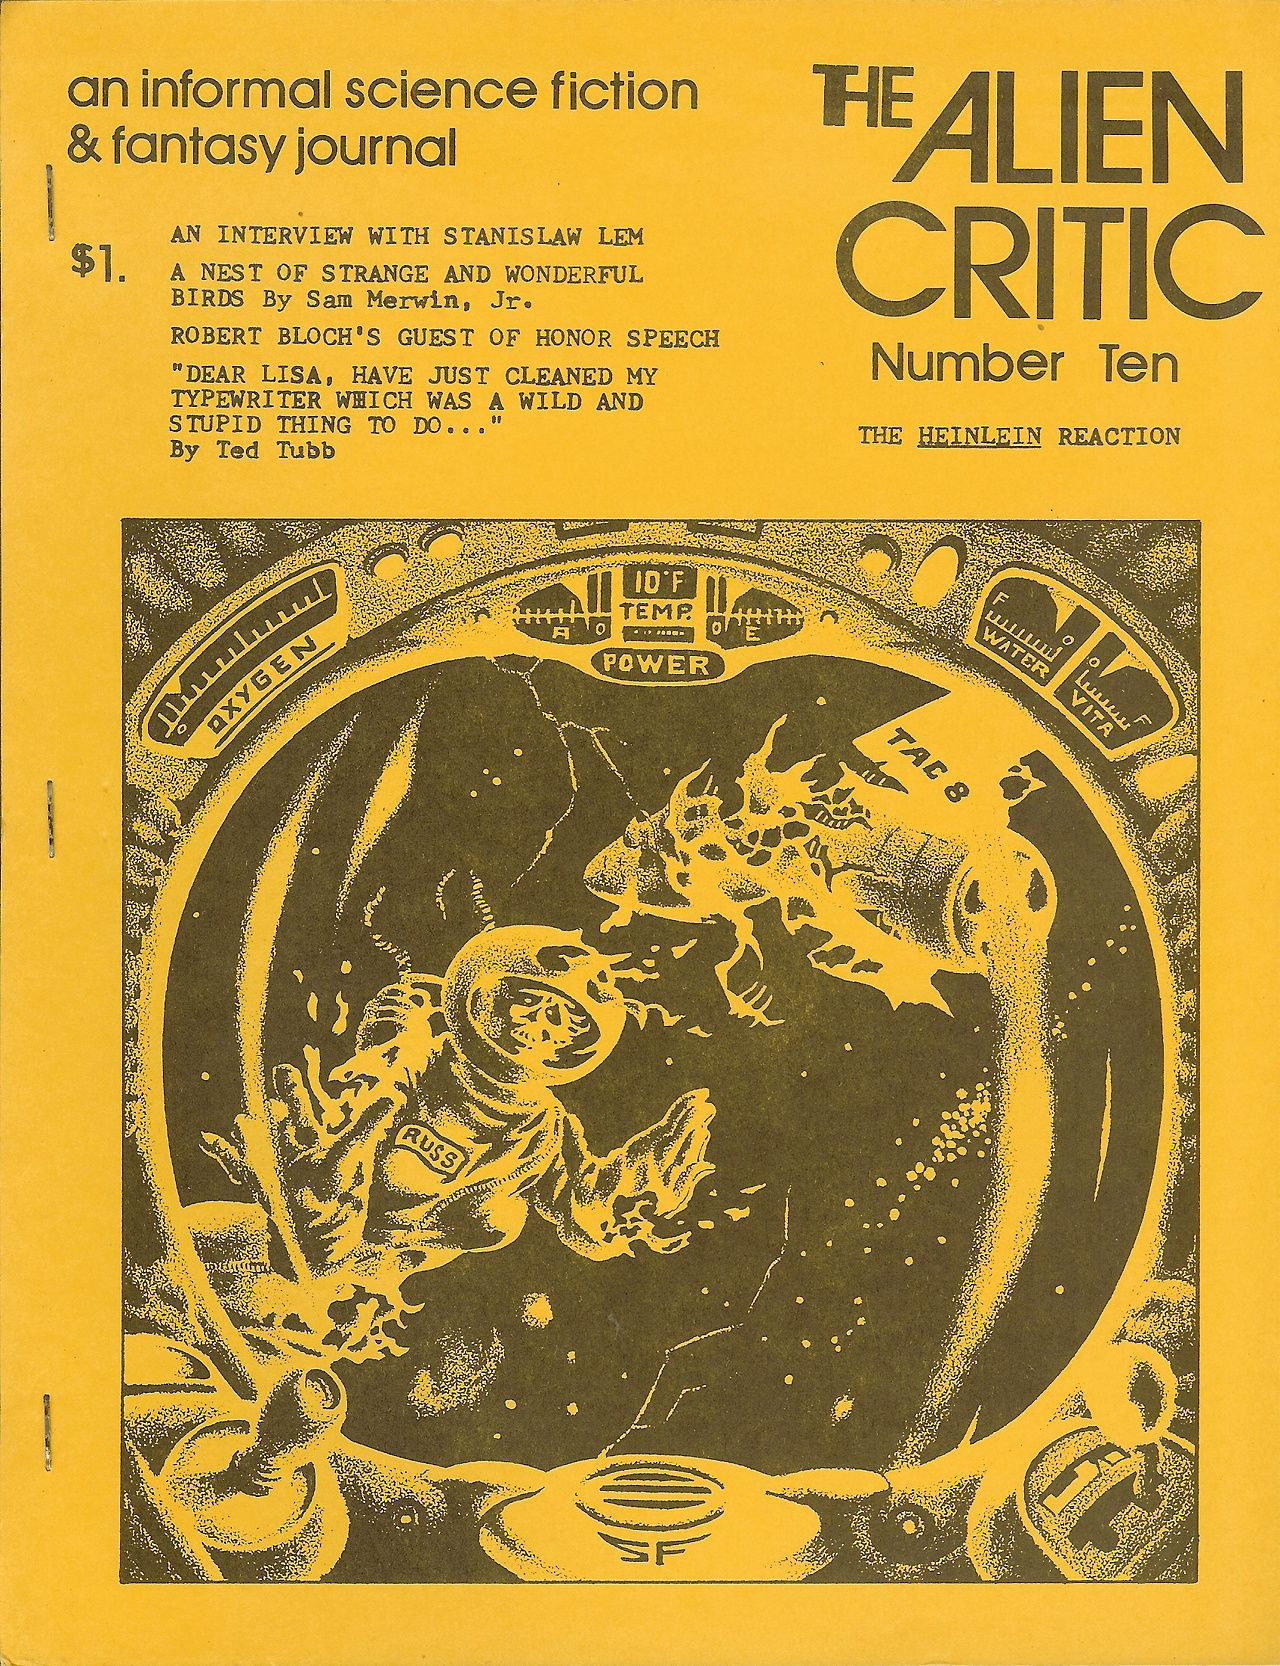 Steven Fabian, The Alien Critic, 1973. [Cadwalader Ringgold]